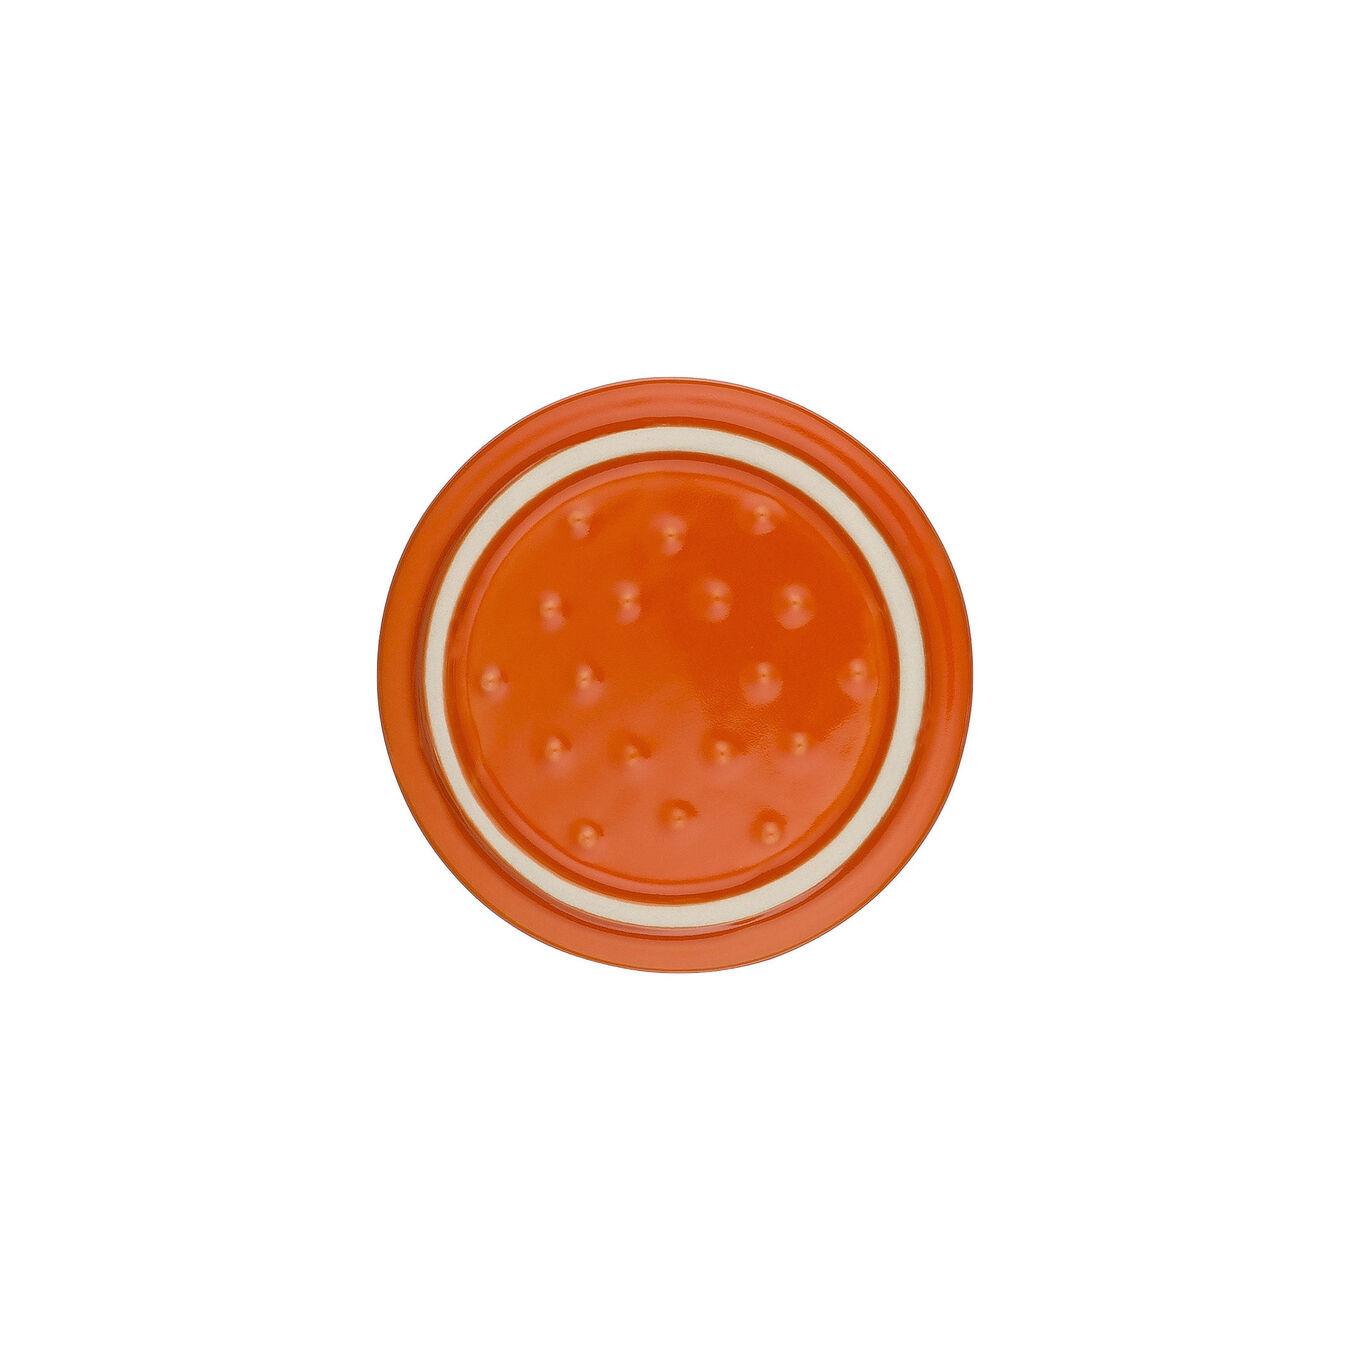 Mini Cocotte 10 cm, Rund, Orange, Stentøj,,large 2